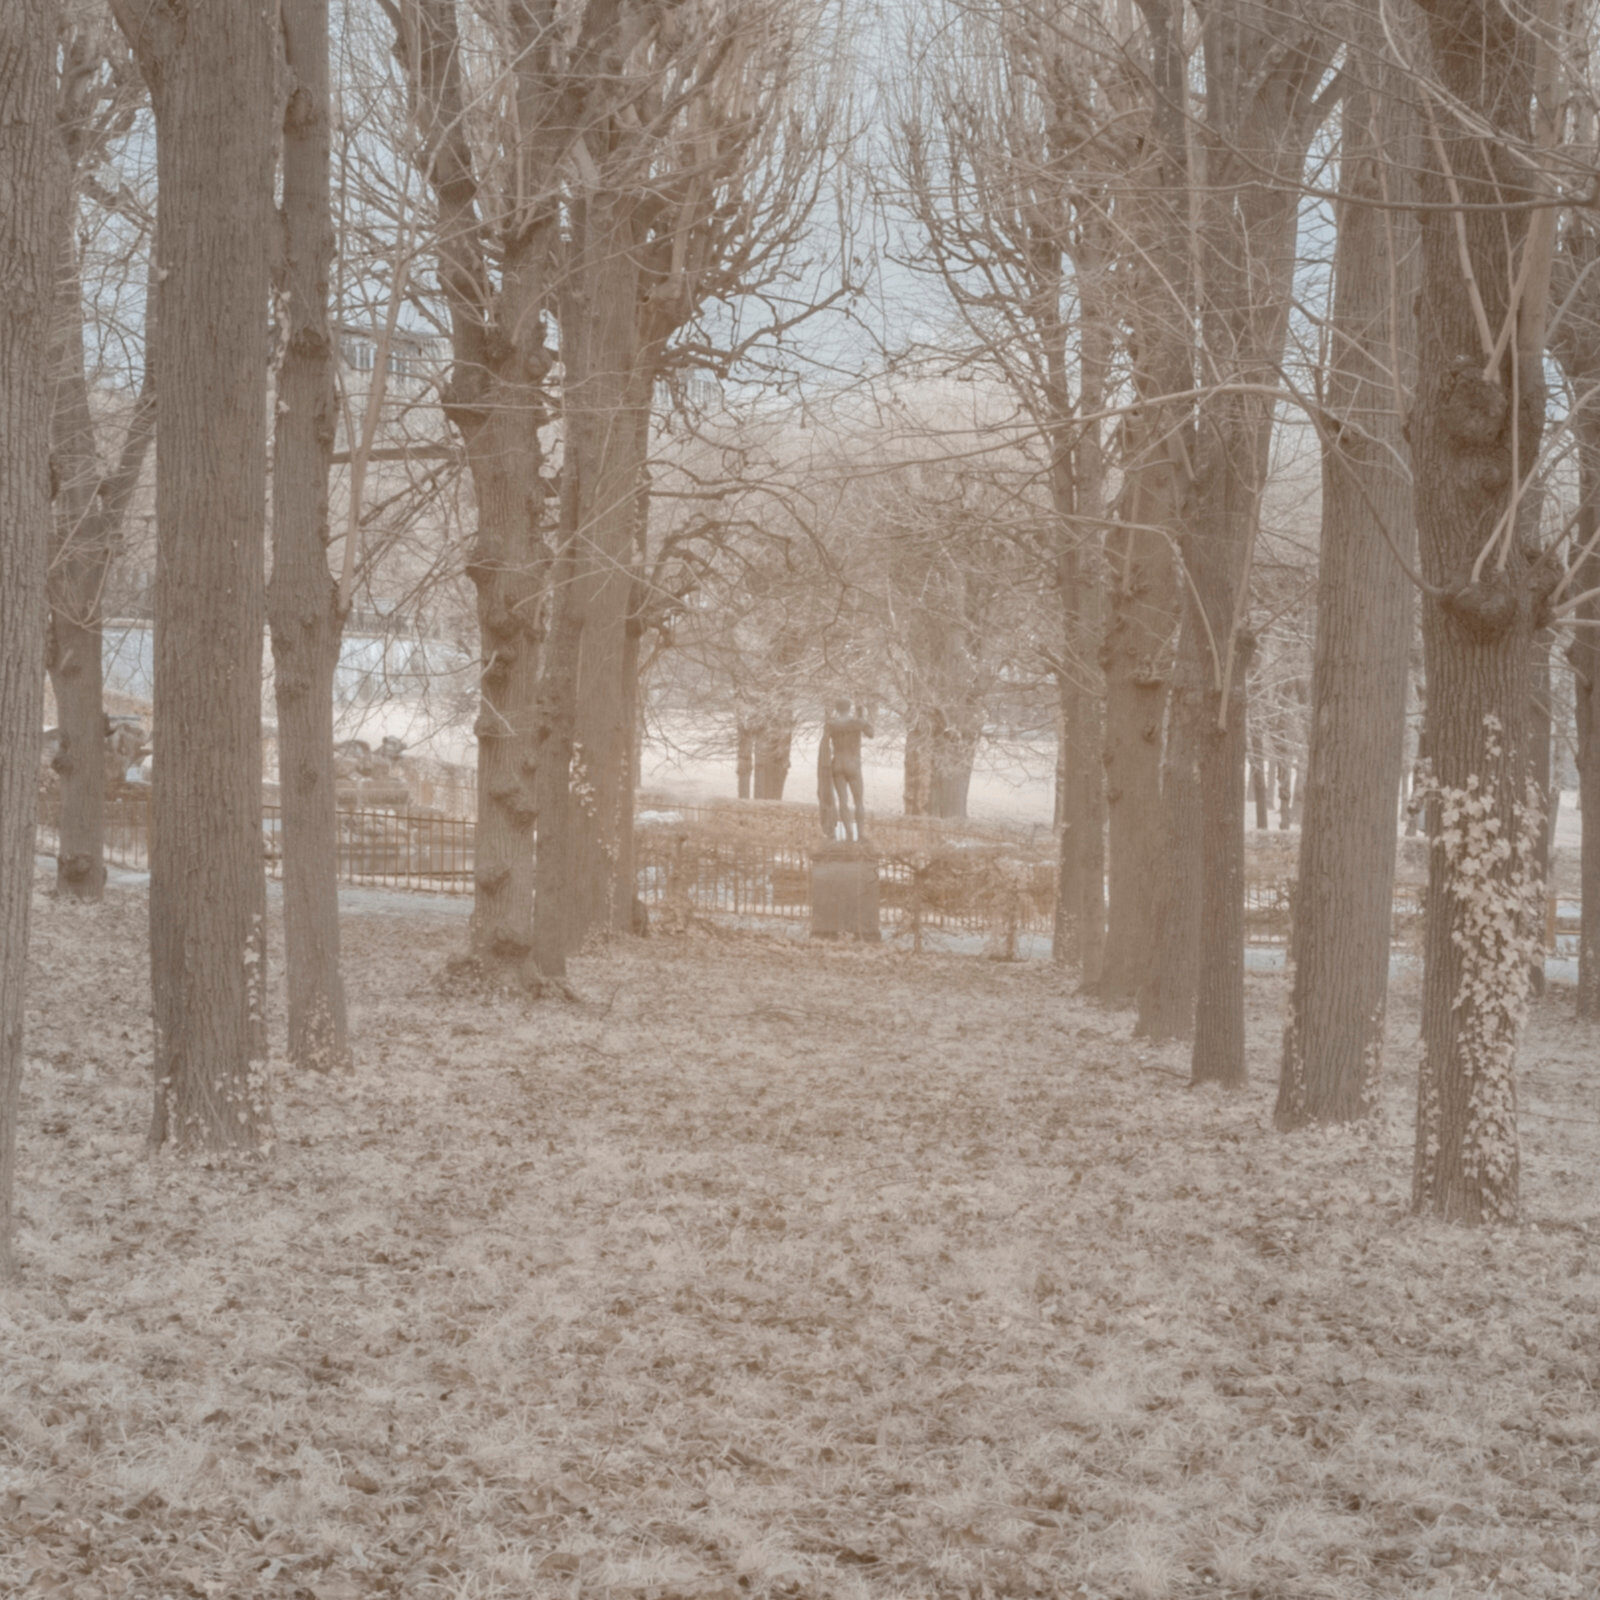 DETAILS 2 24mm F16 SIGMA 1 | Pierre-Louis Ferrer | Test du SIGMA 24mm F/1.4 DG HSM Art en photographie infrarouge | Partie 1